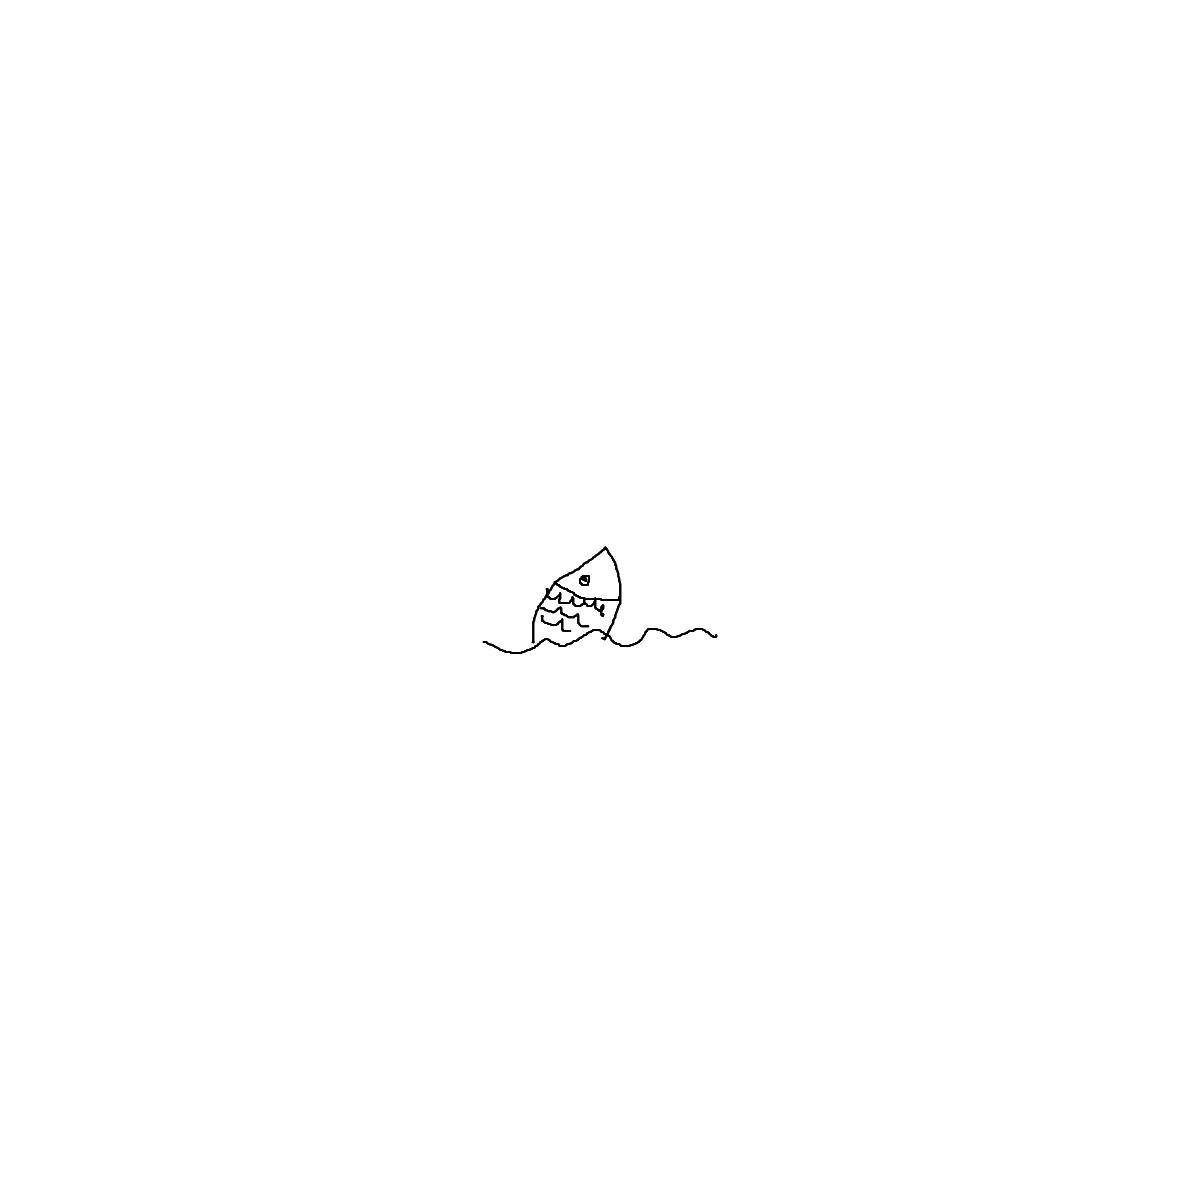 BAAAM drawing#22886 lat:31.7989234924316400lng: 34.6239585876464840